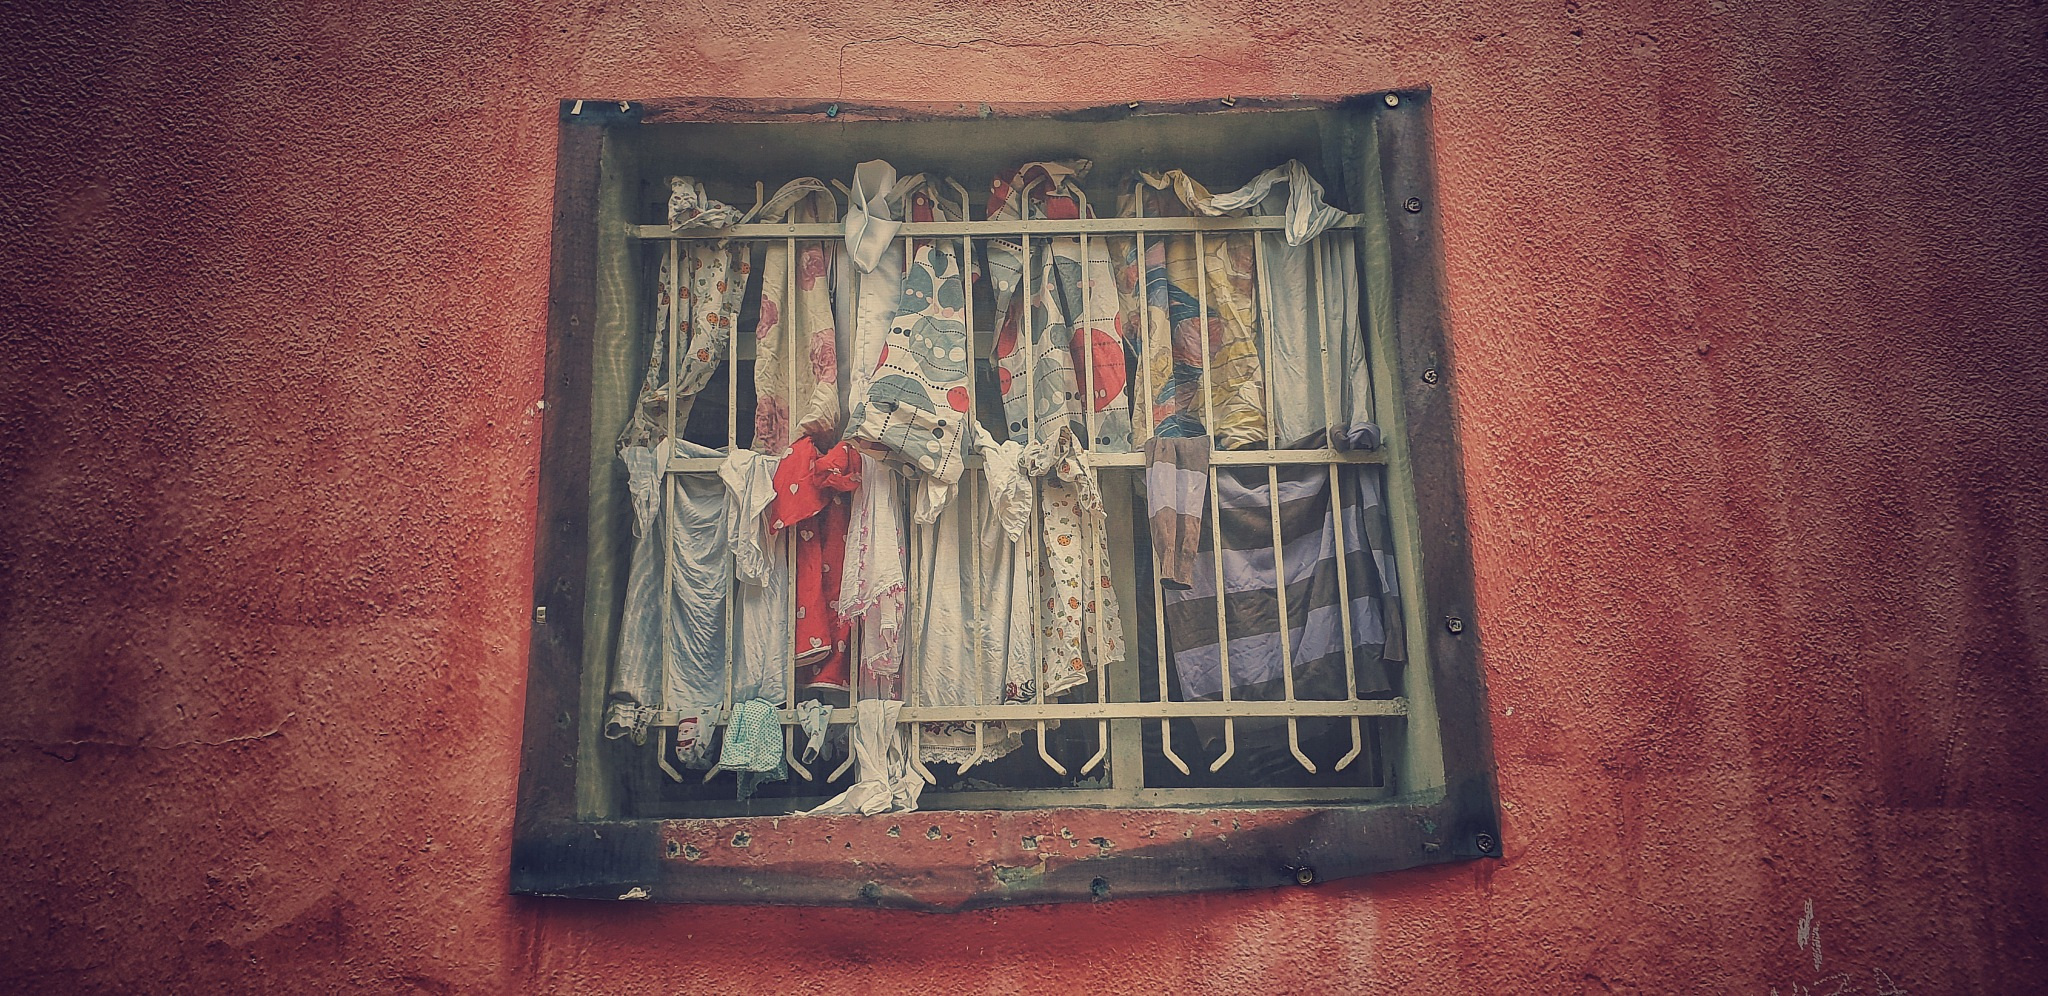 Dry cleaning by Meriç Aksu